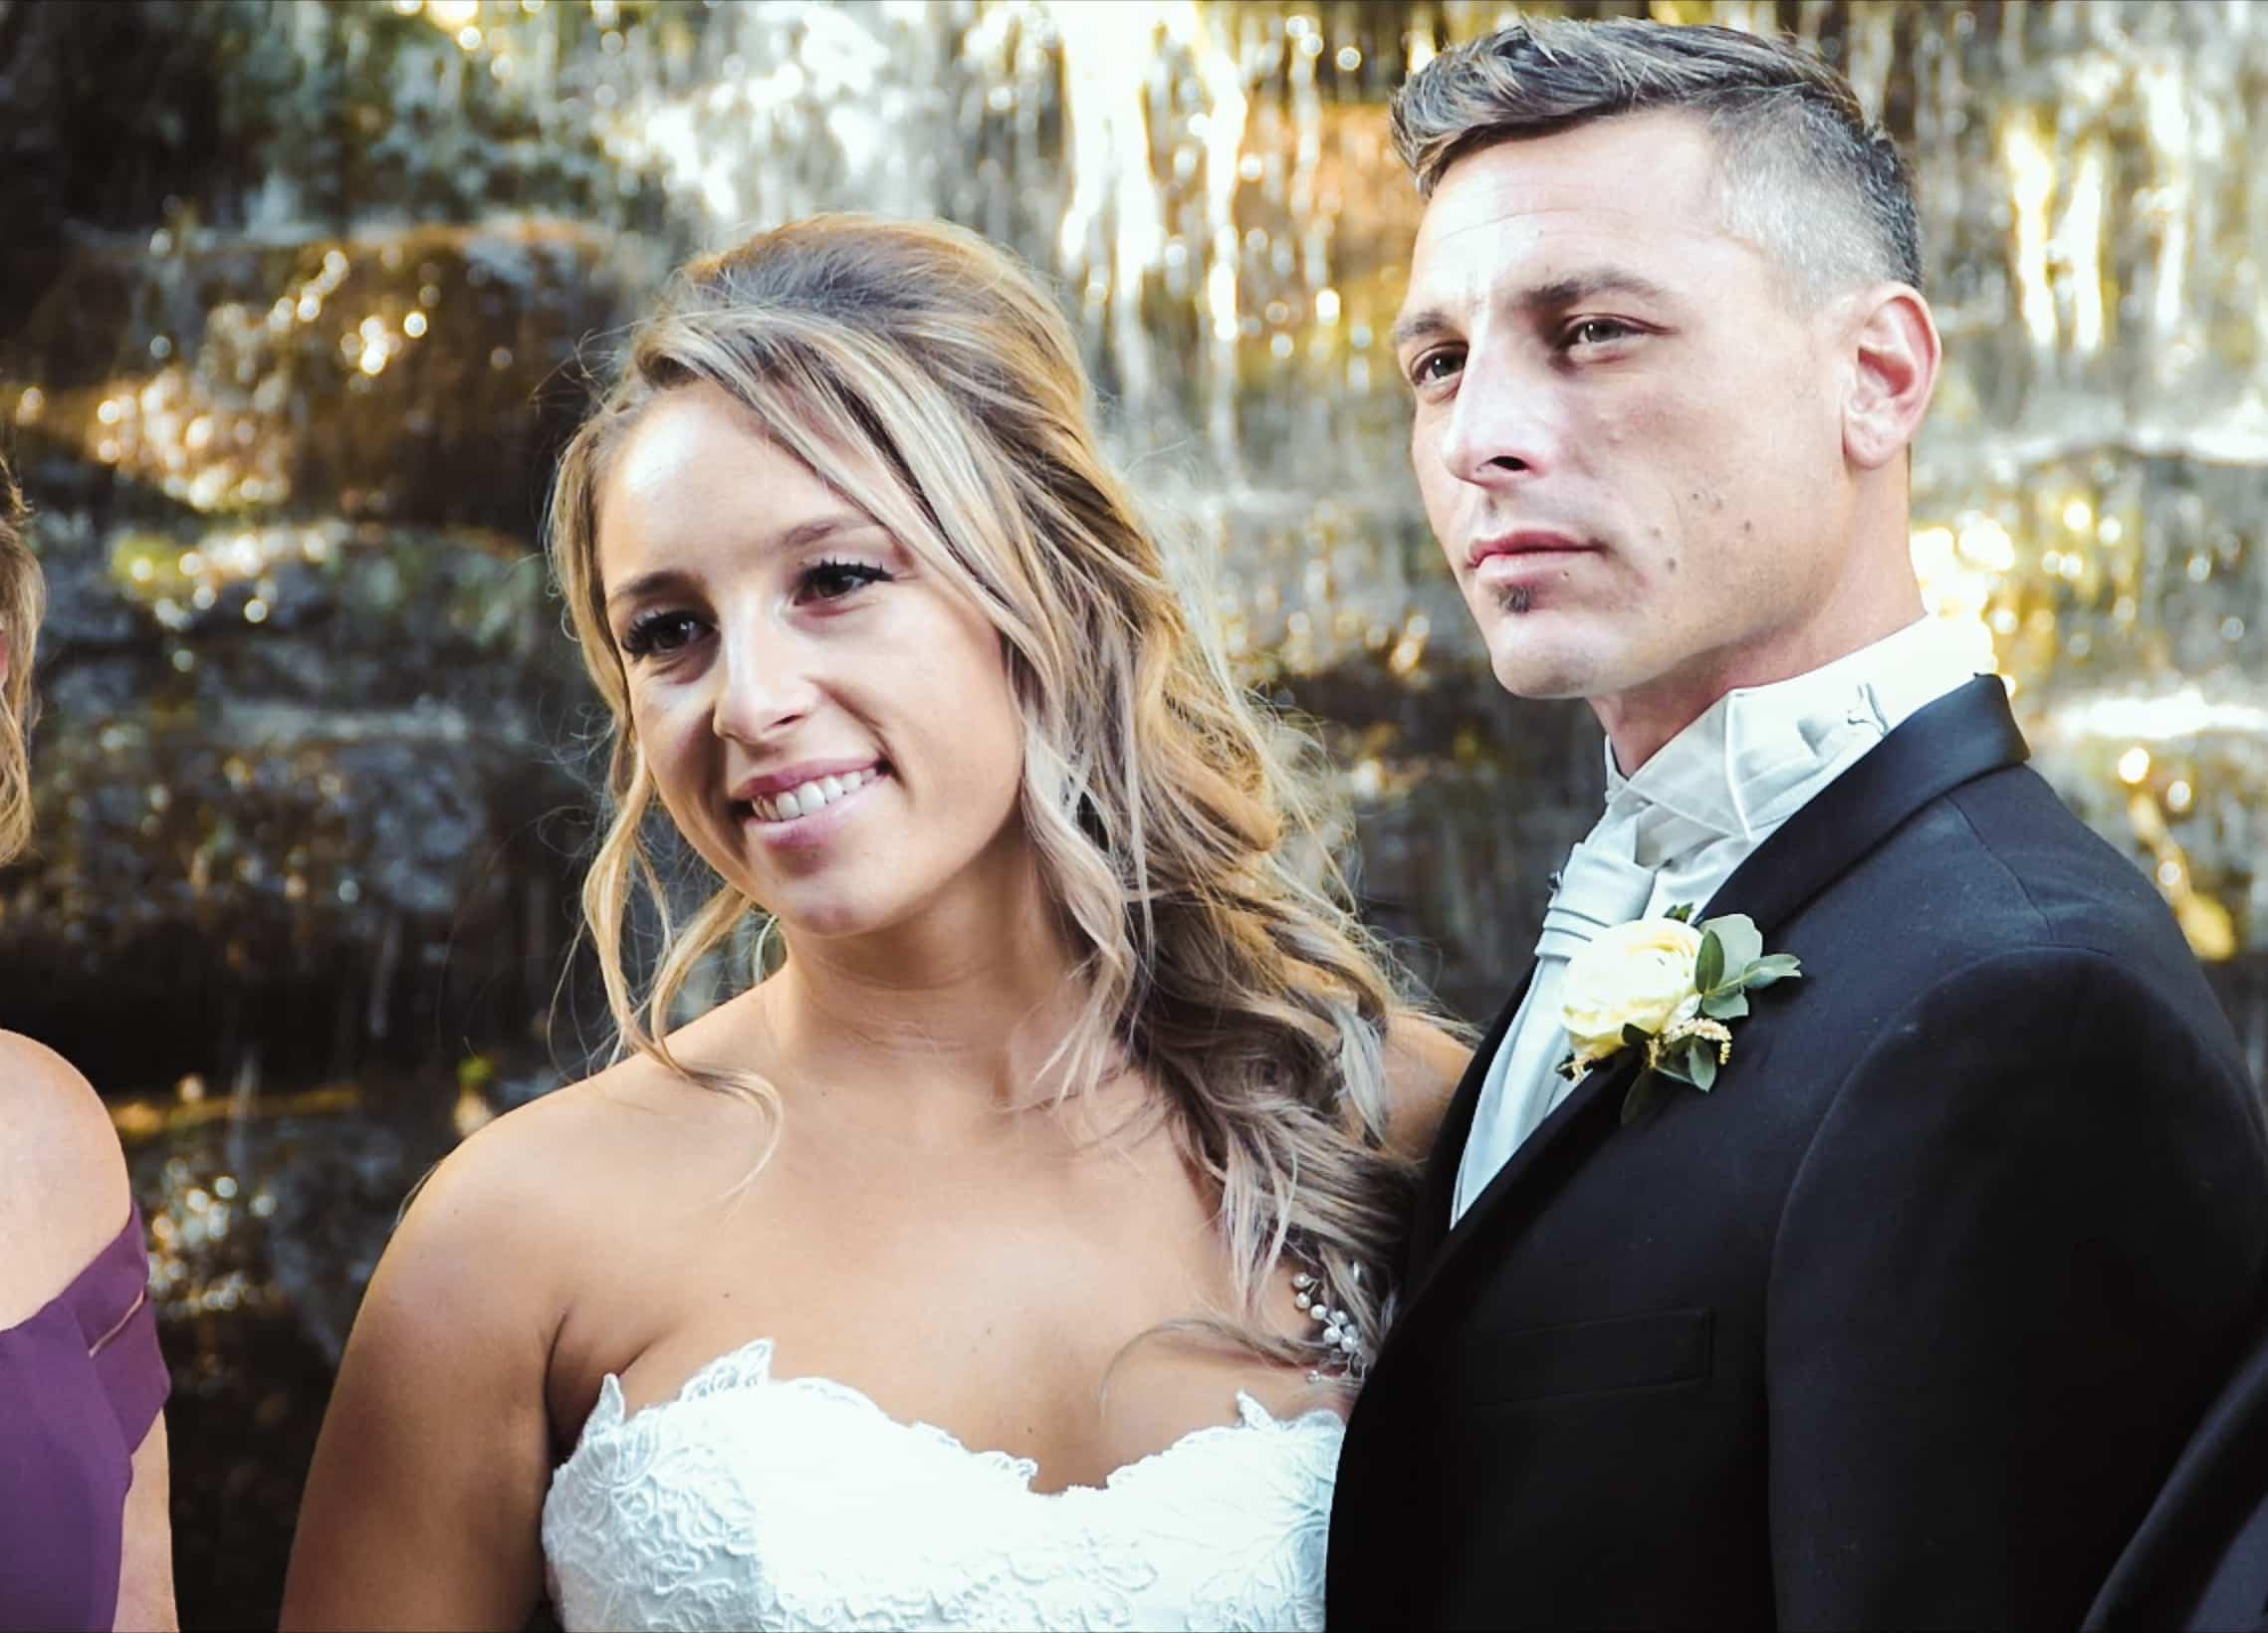 Mariage, Couple de mariés, vidéo de mariage, film de mariage